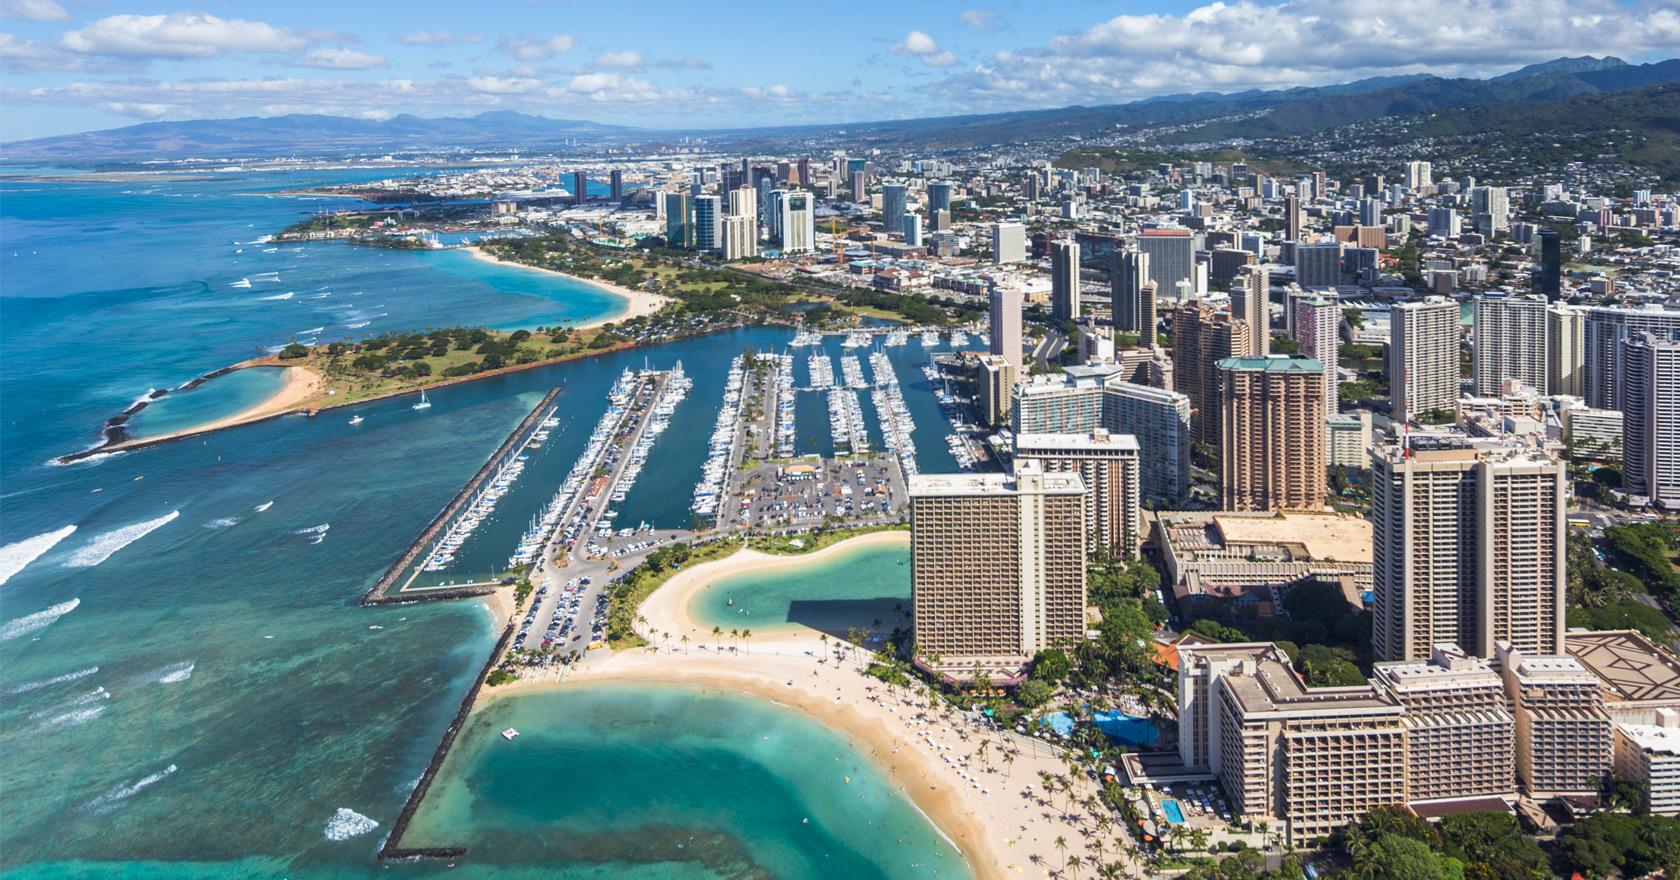 Grand Islander by Hilton Grand Vacations 2019 Maintenance Fees